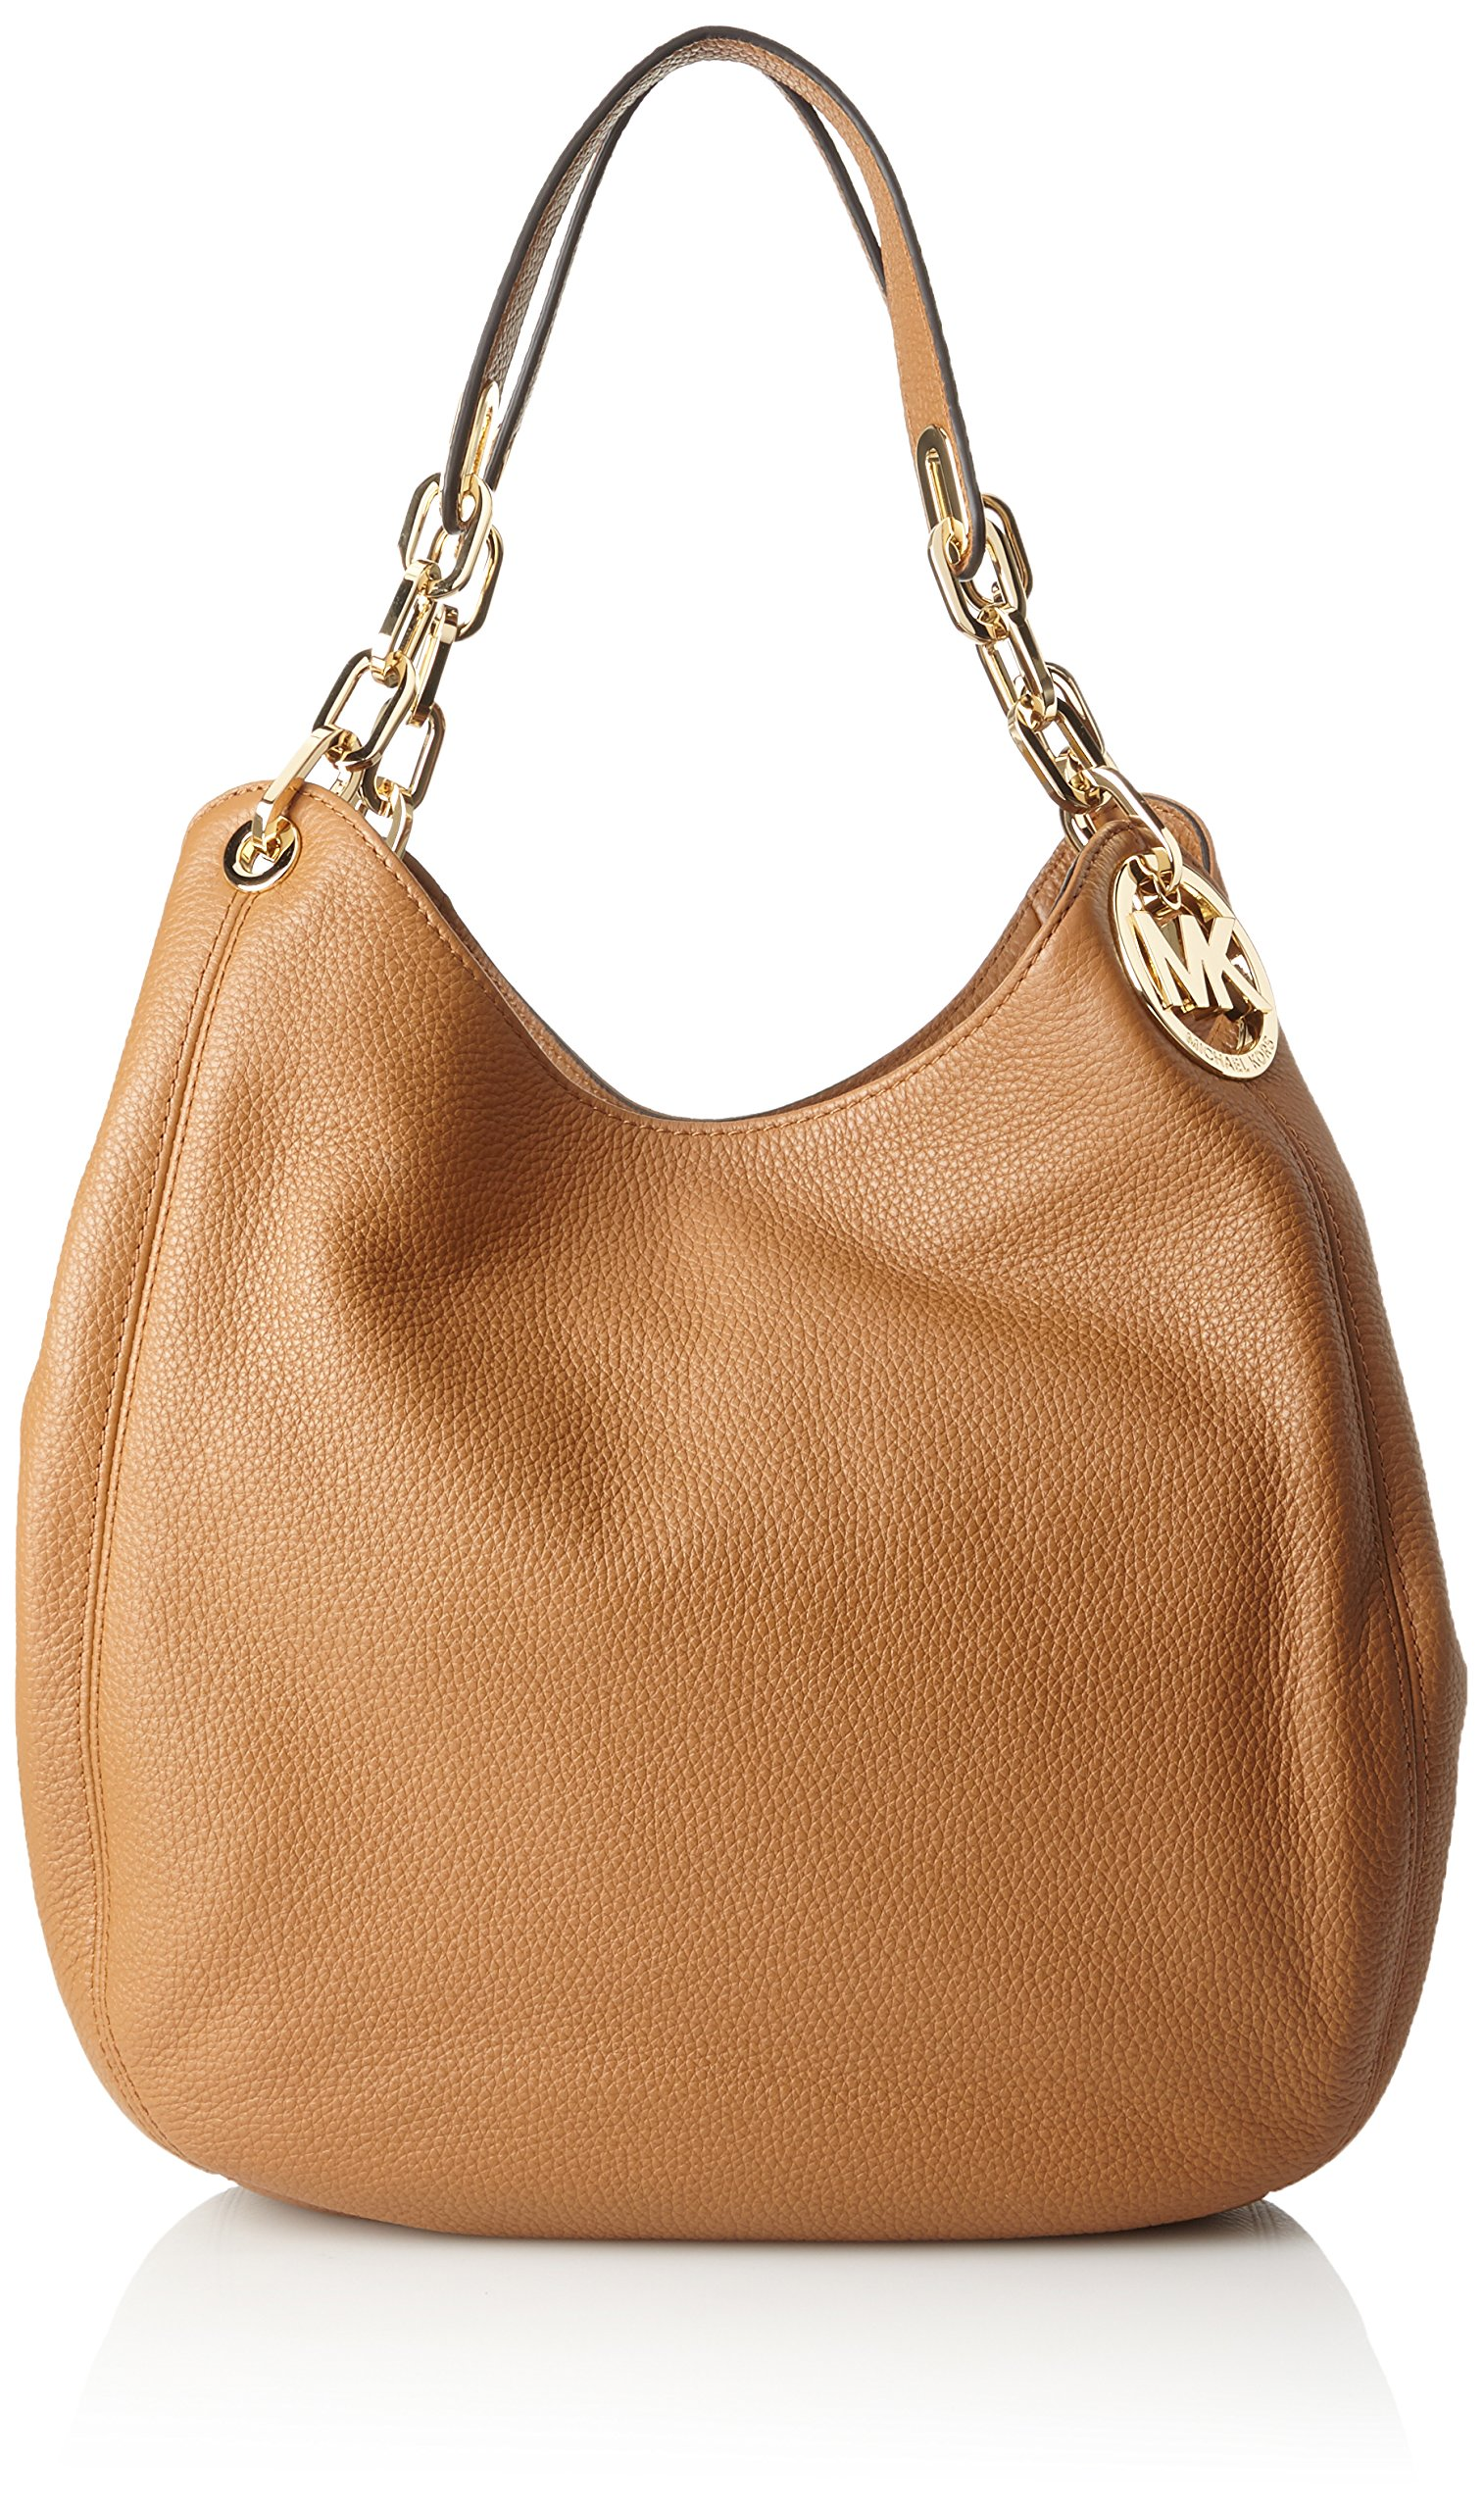 michael kors shoulder handbags amazon com rh amazon com